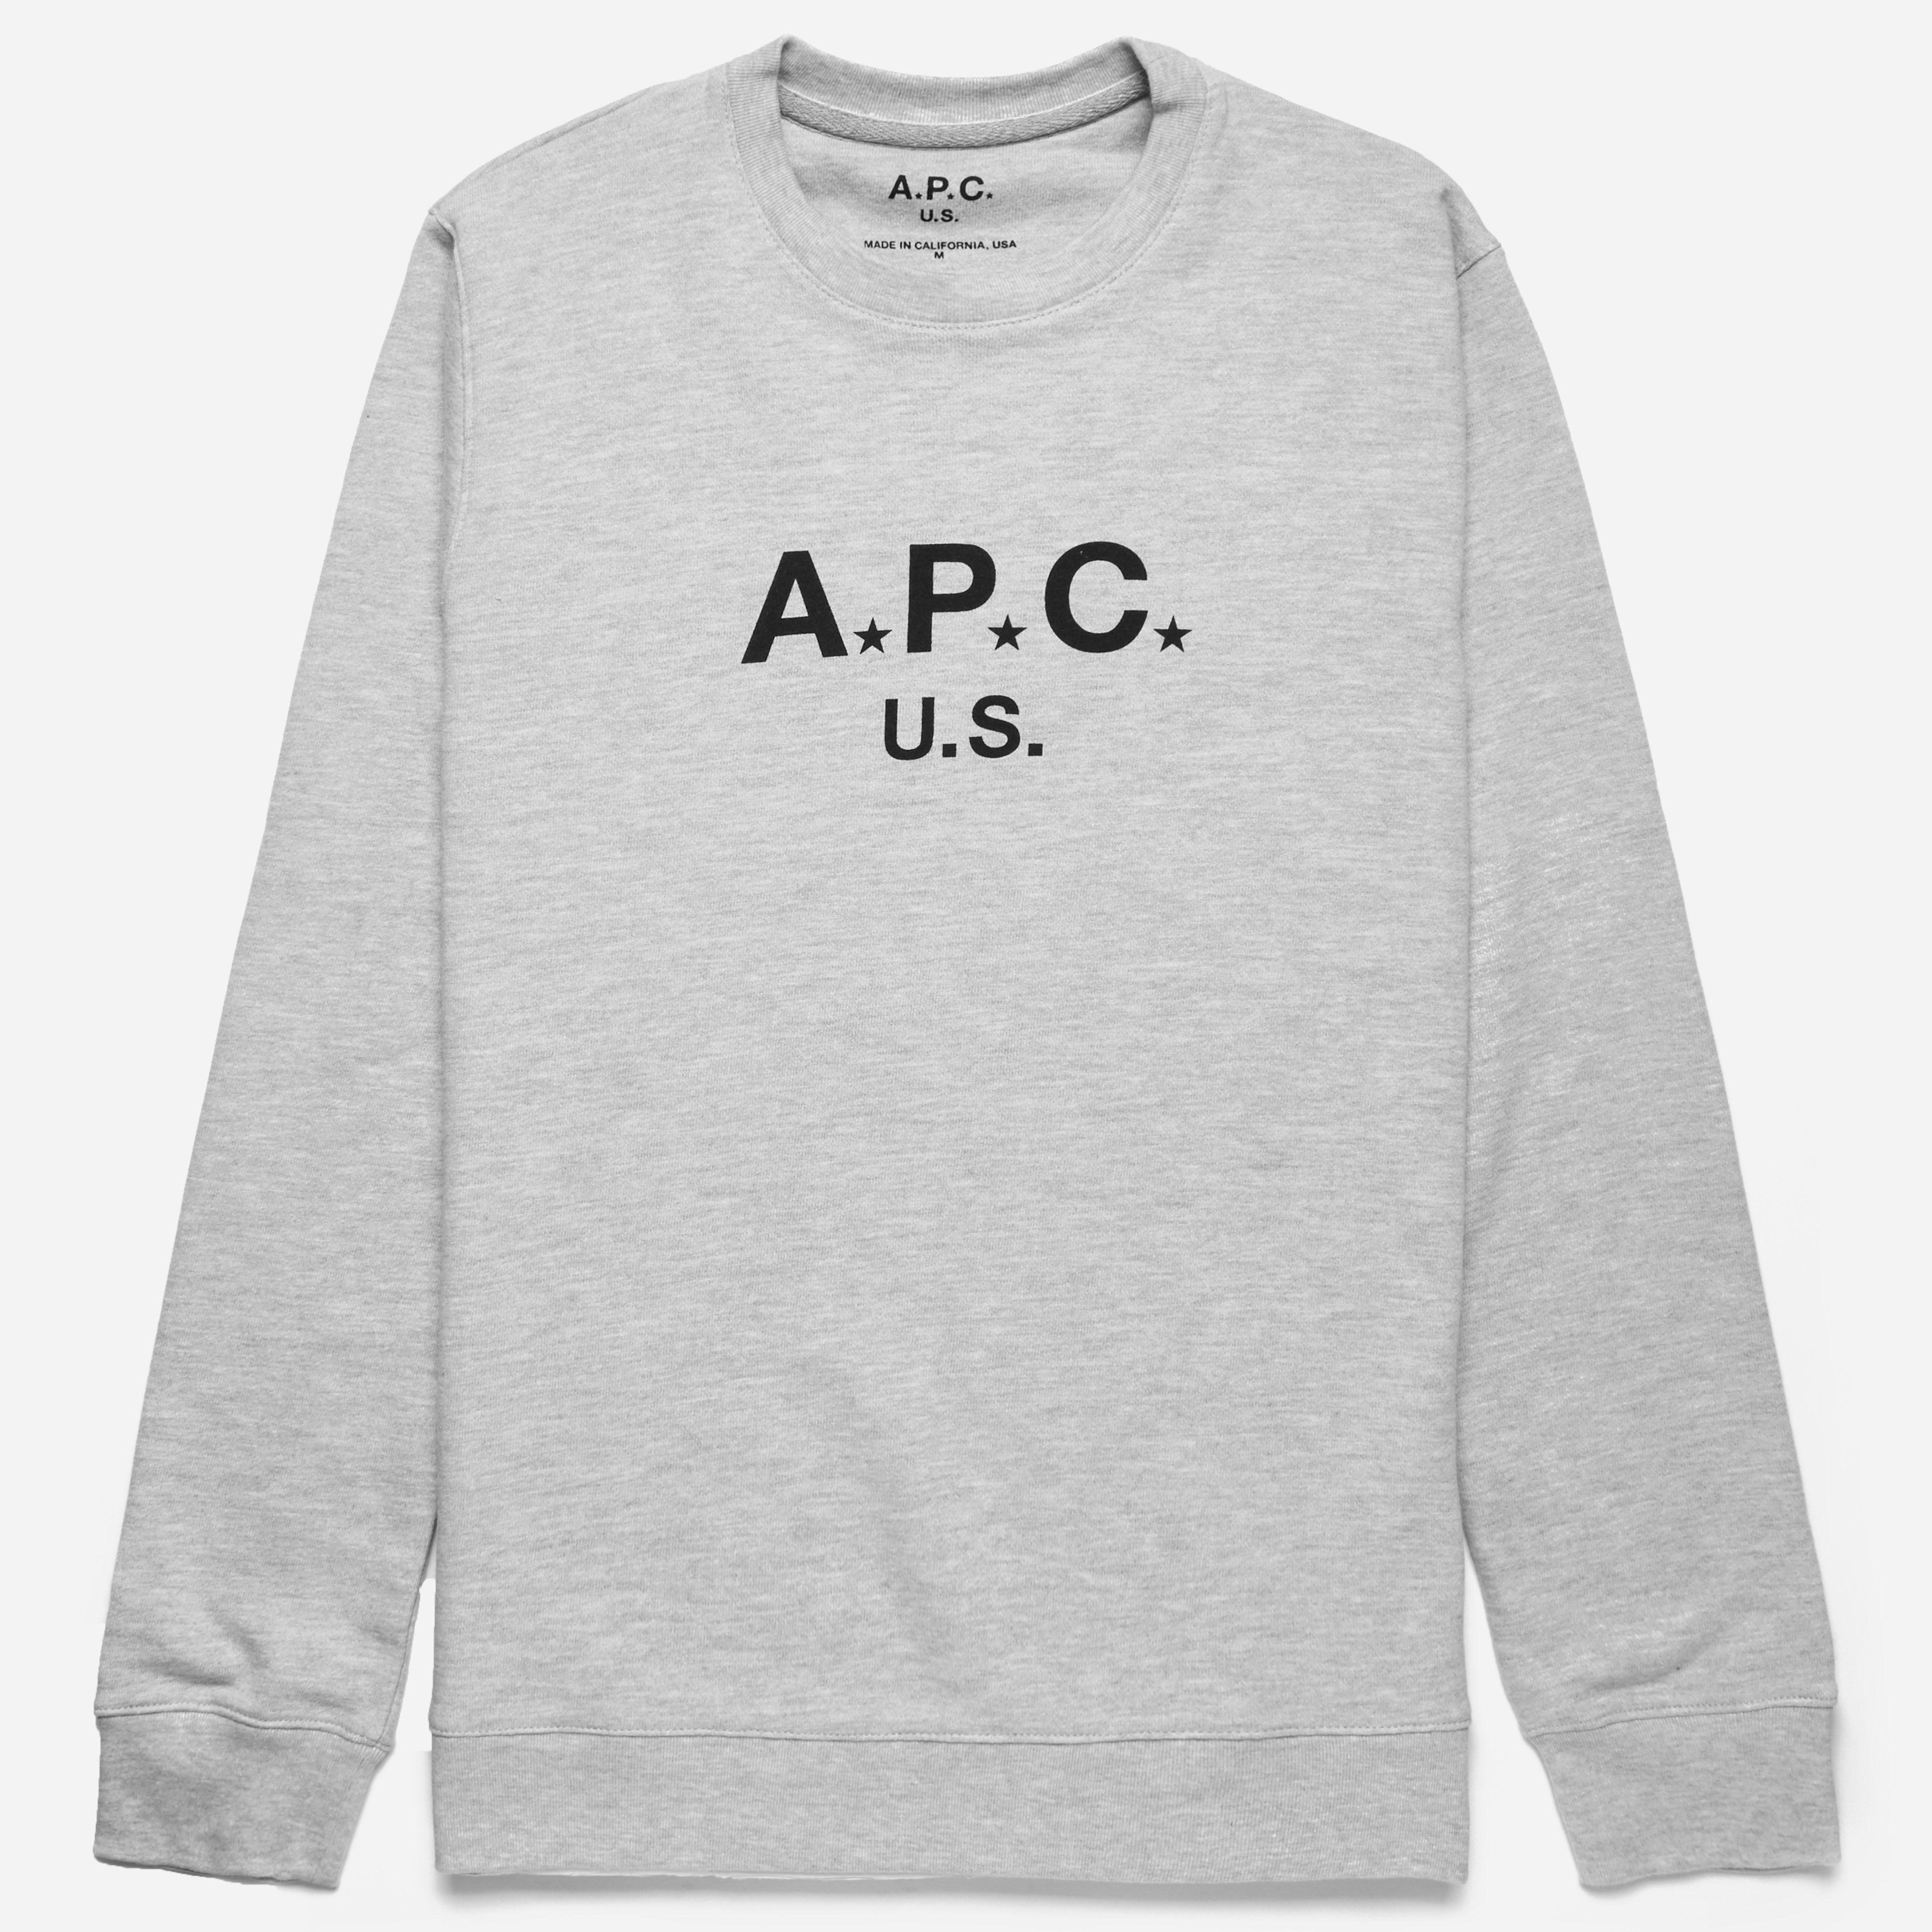 A.P.C U.S Sweatshirt